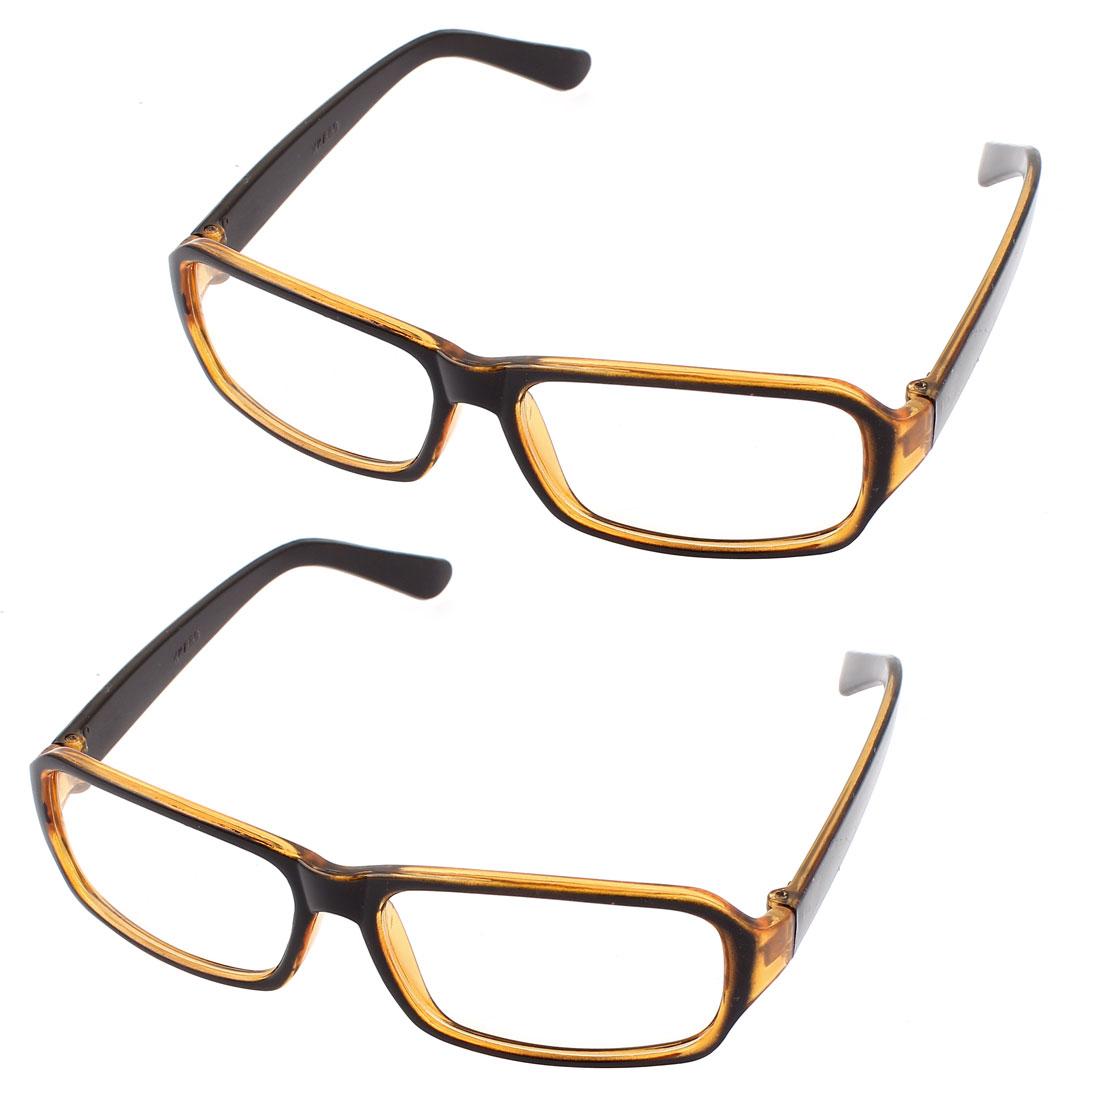 Unisex Single Bridge Clear Lens Eyewear Plain Glasses Orange Black 2Pcs